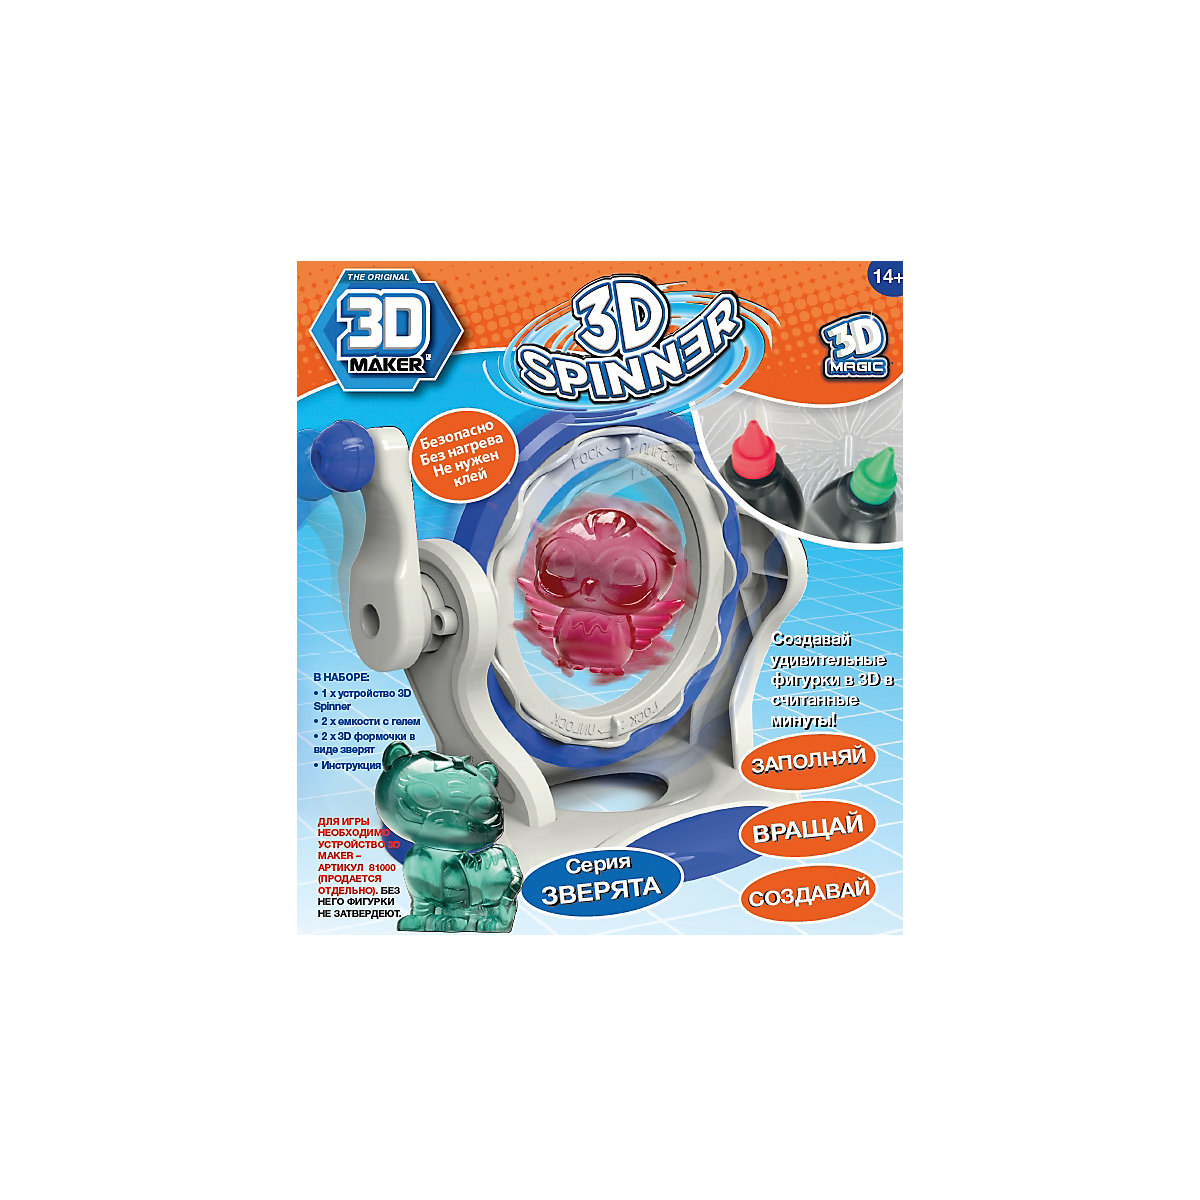 3D MAGIC Craft Toys 7231332 For Children Kits For Creativity Boy Girl Play Game Development